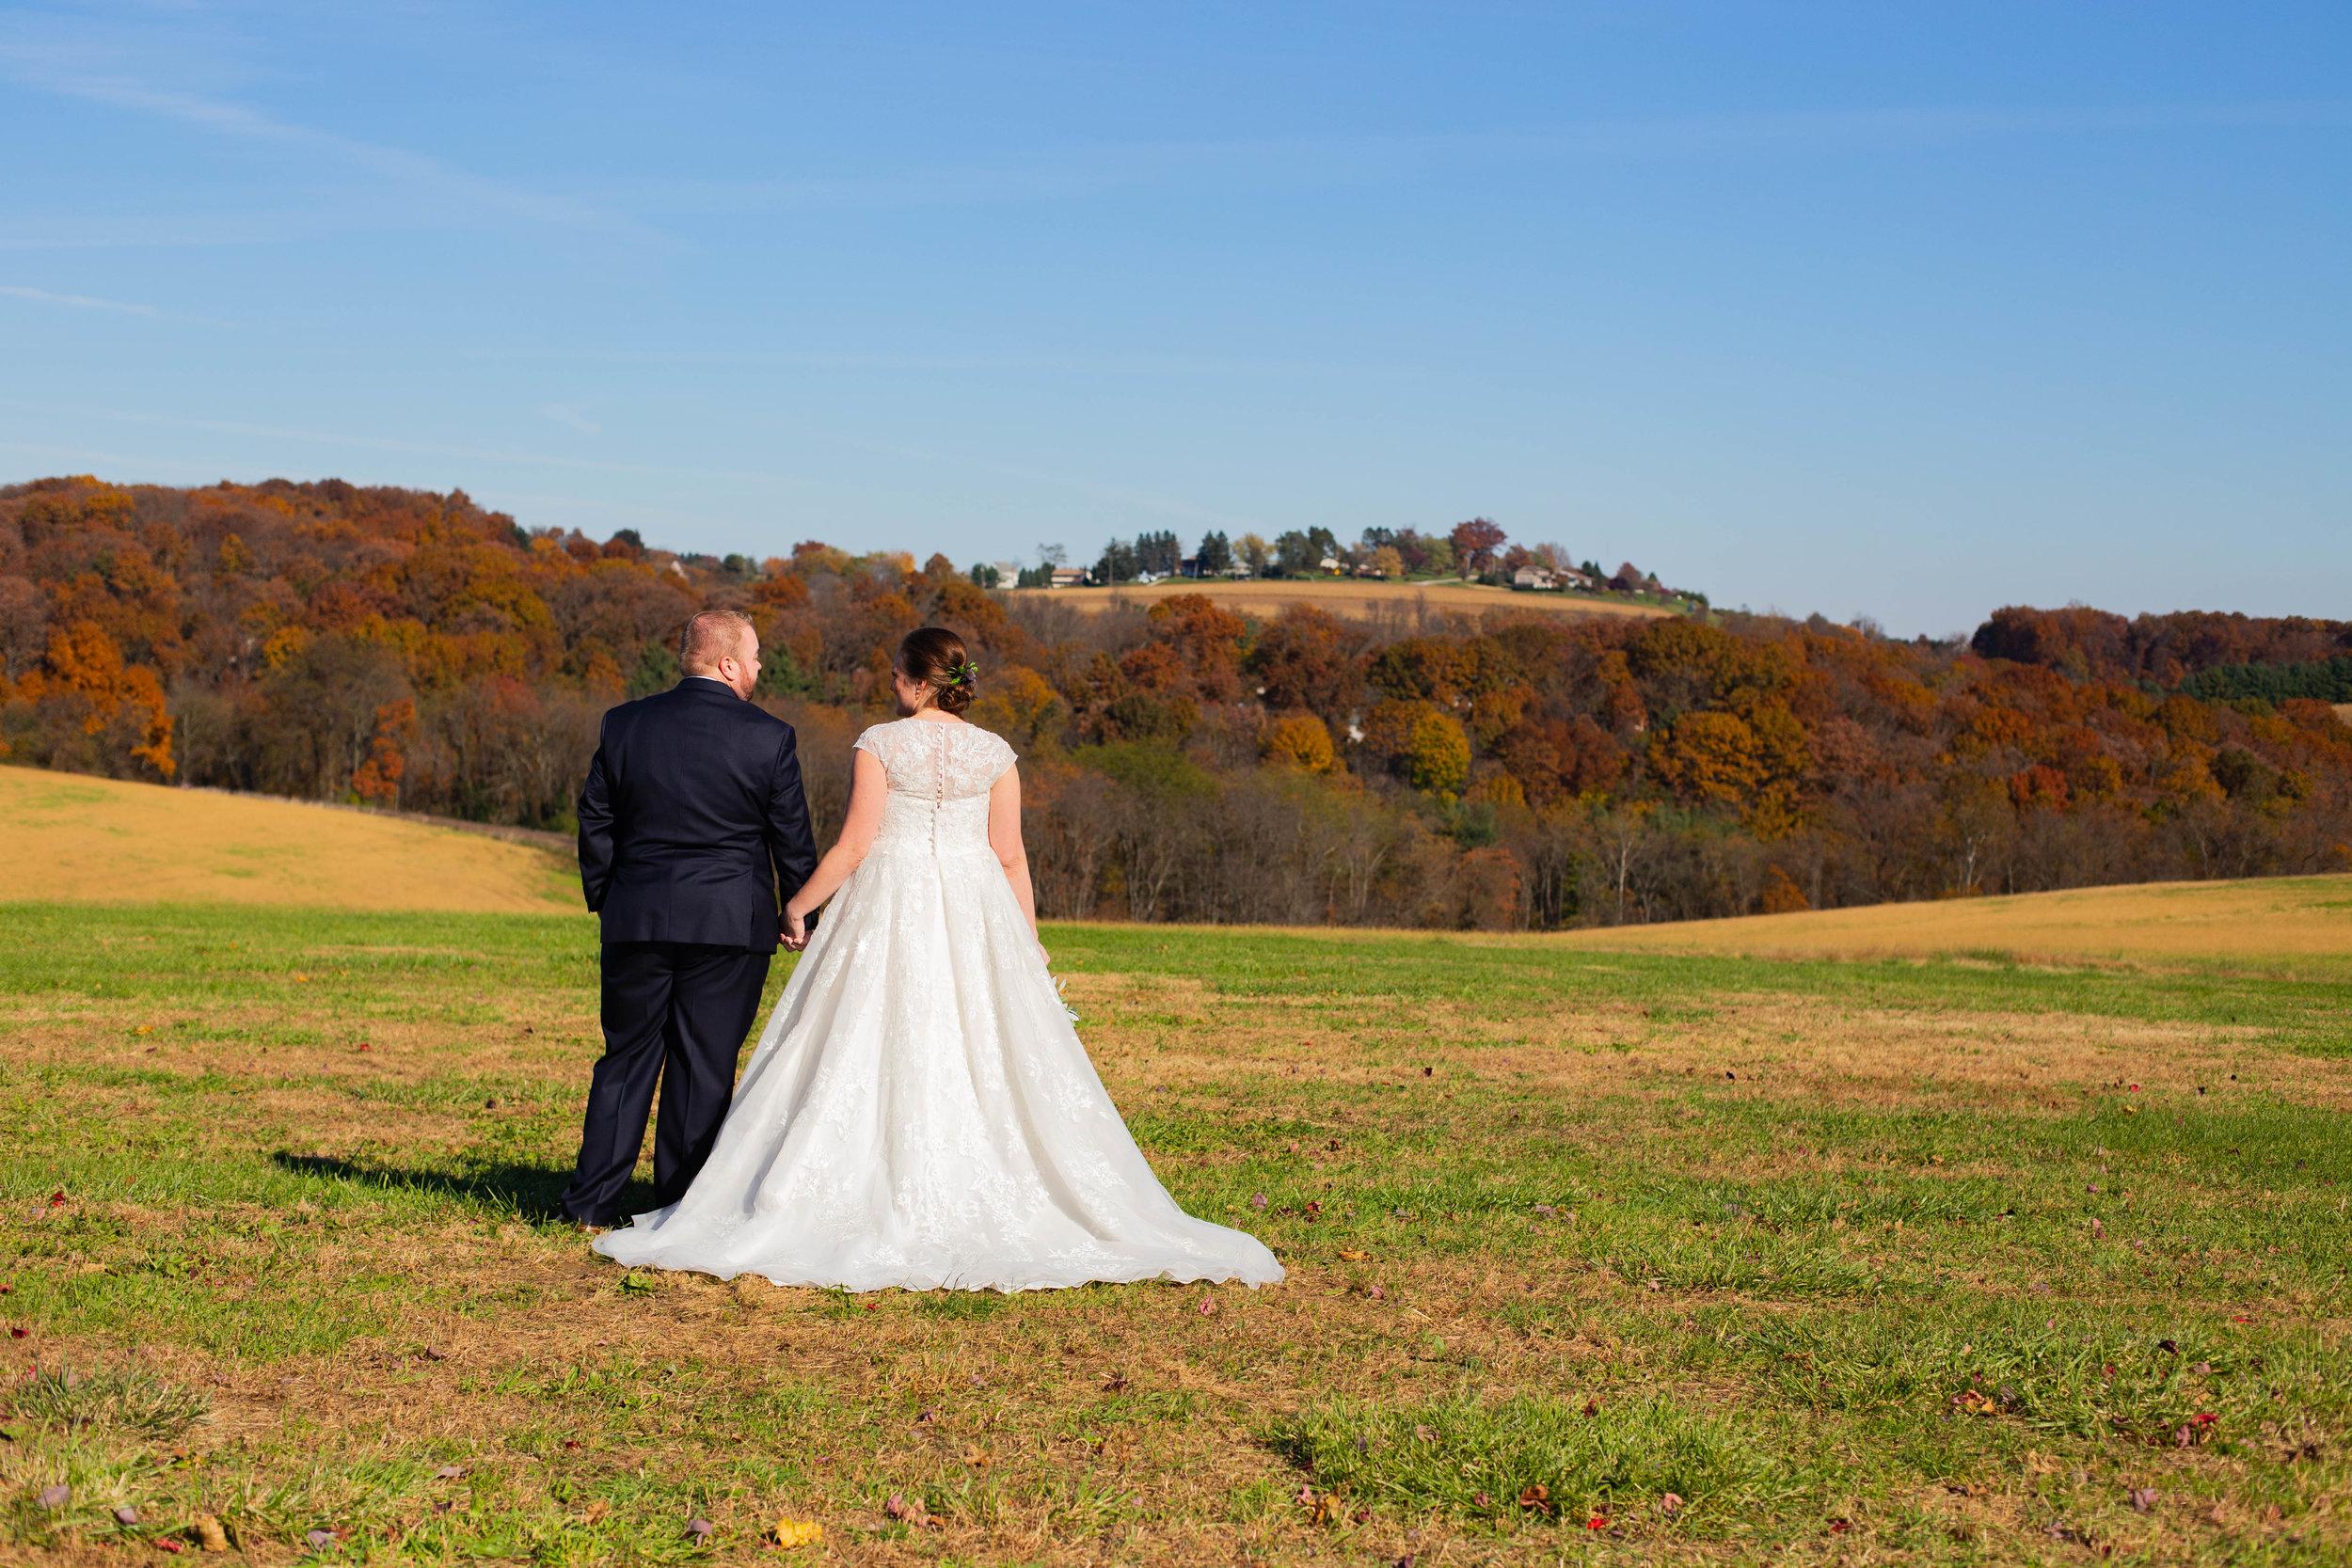 Bride and groom field